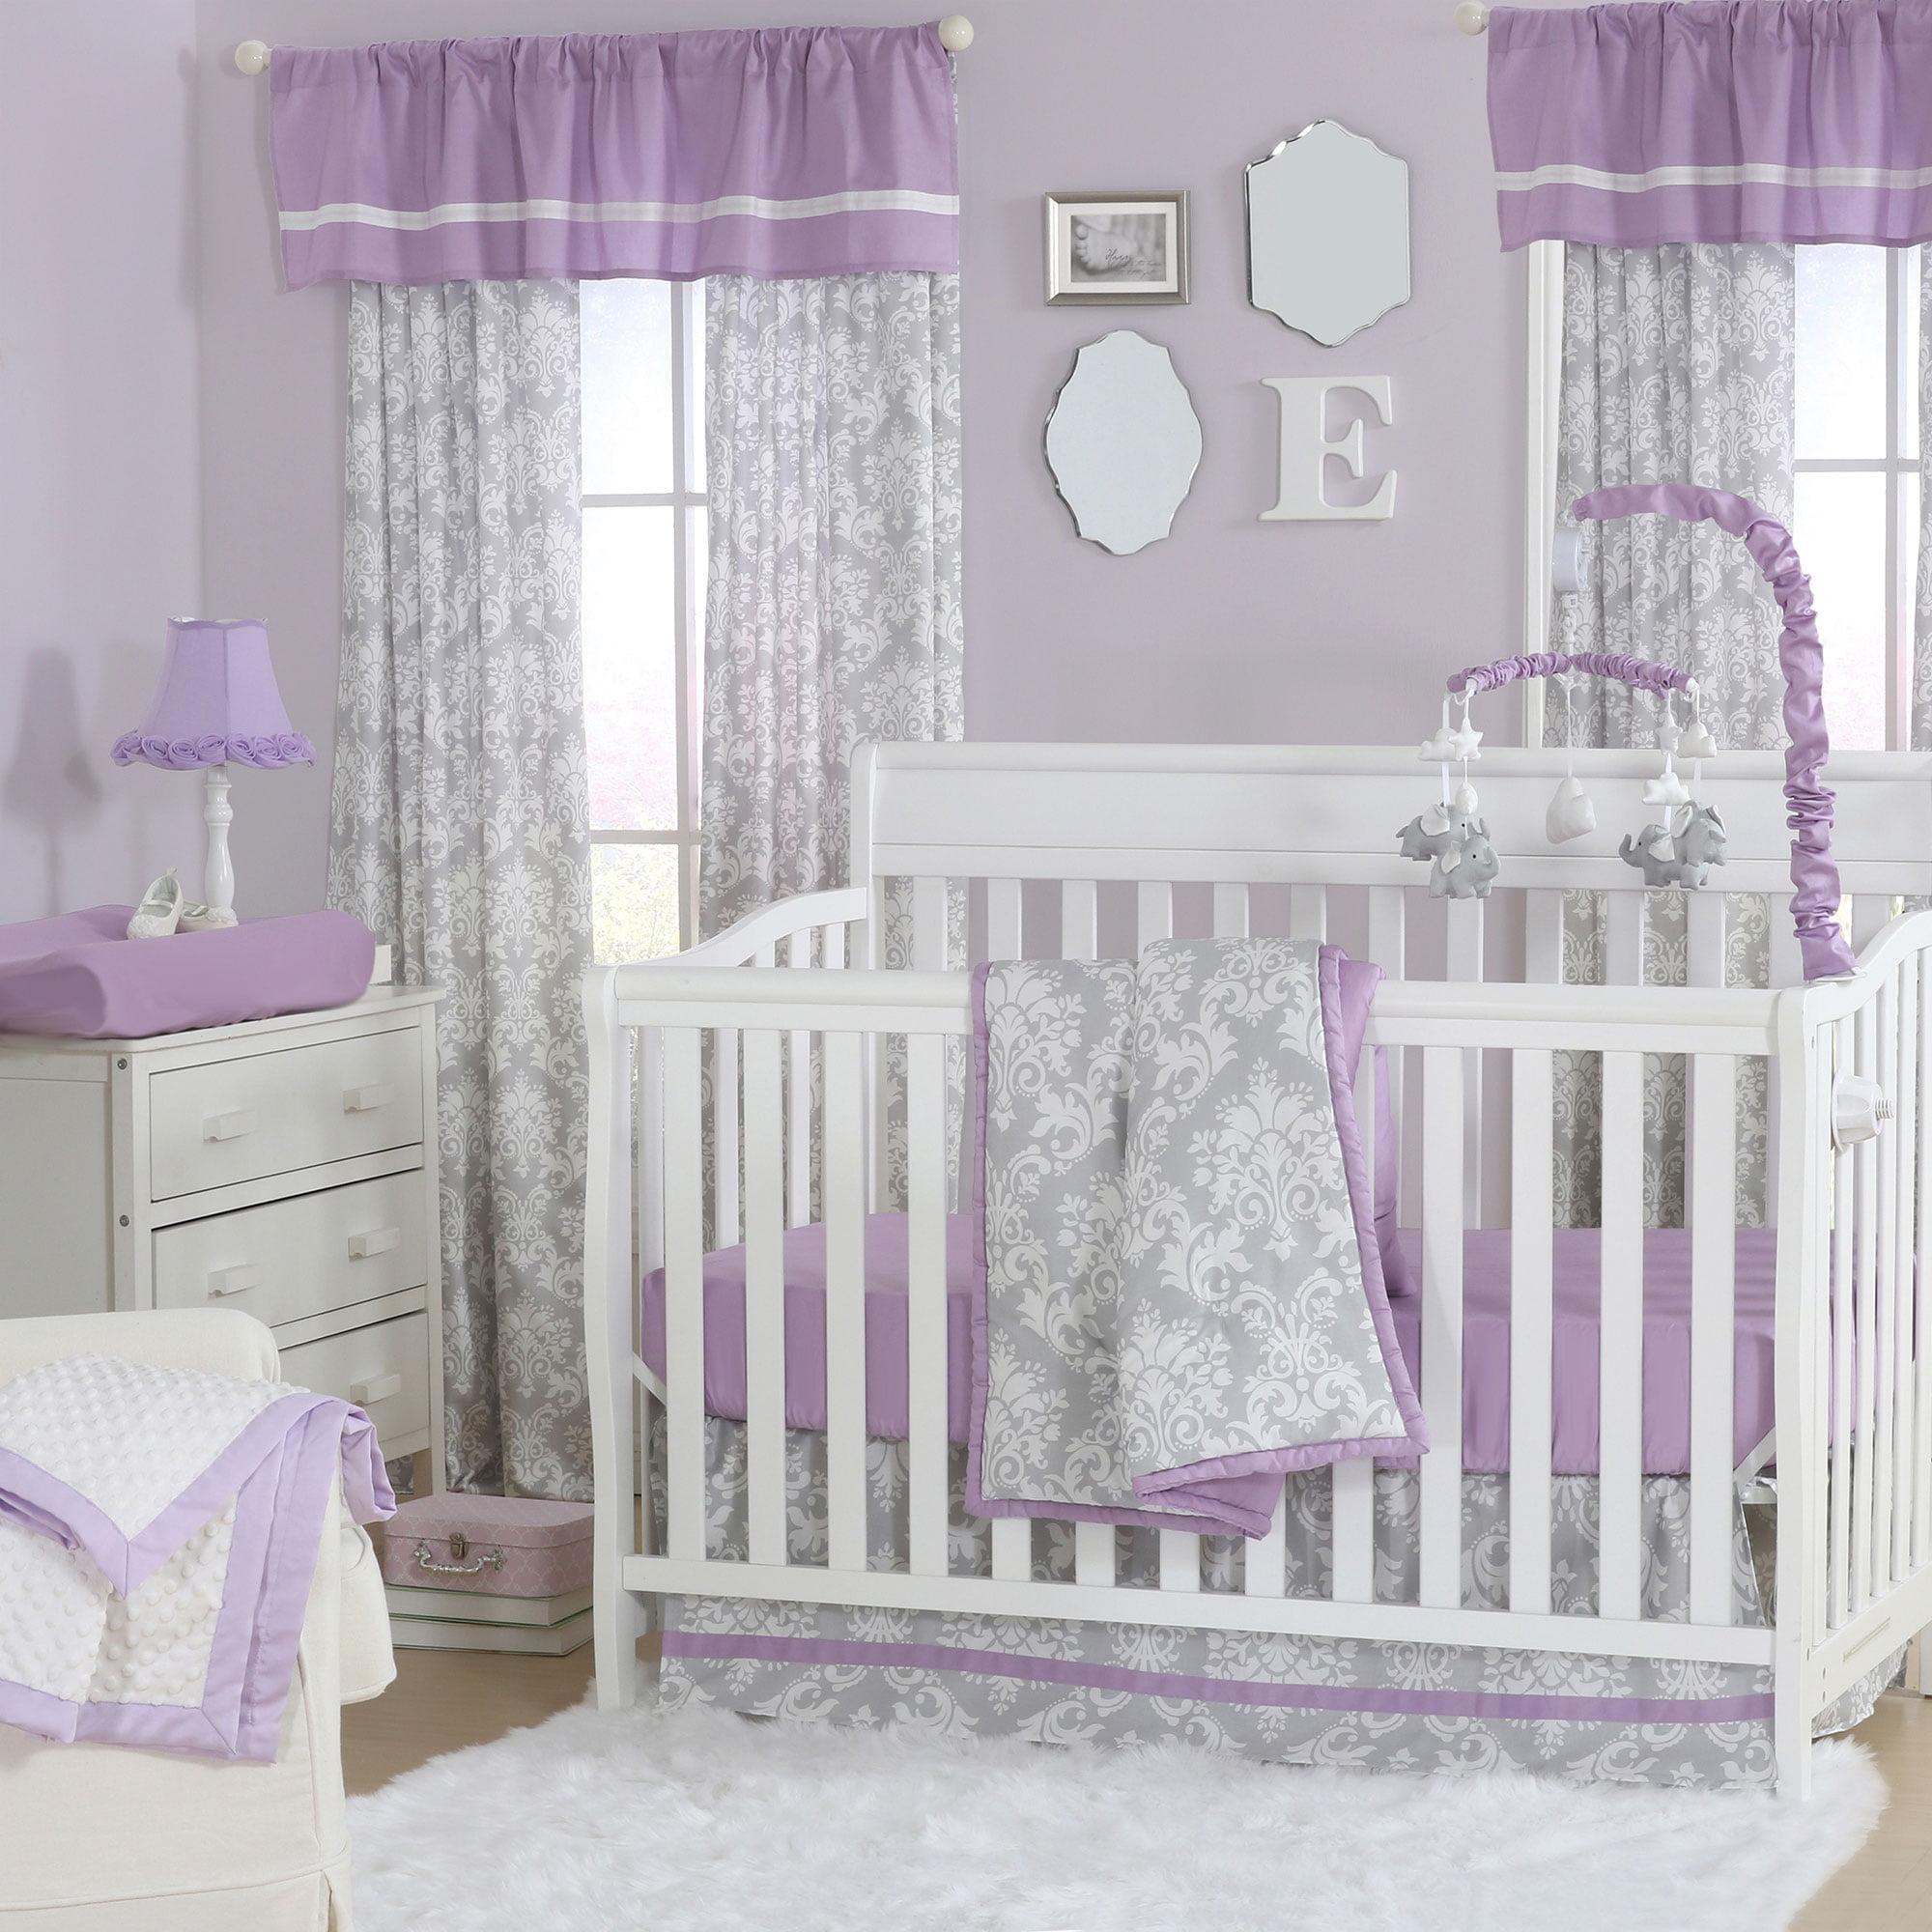 Damsel Damask Purple and Grey Baby Girl Crib Bedding - 11 Piece Sleep Essentials Set